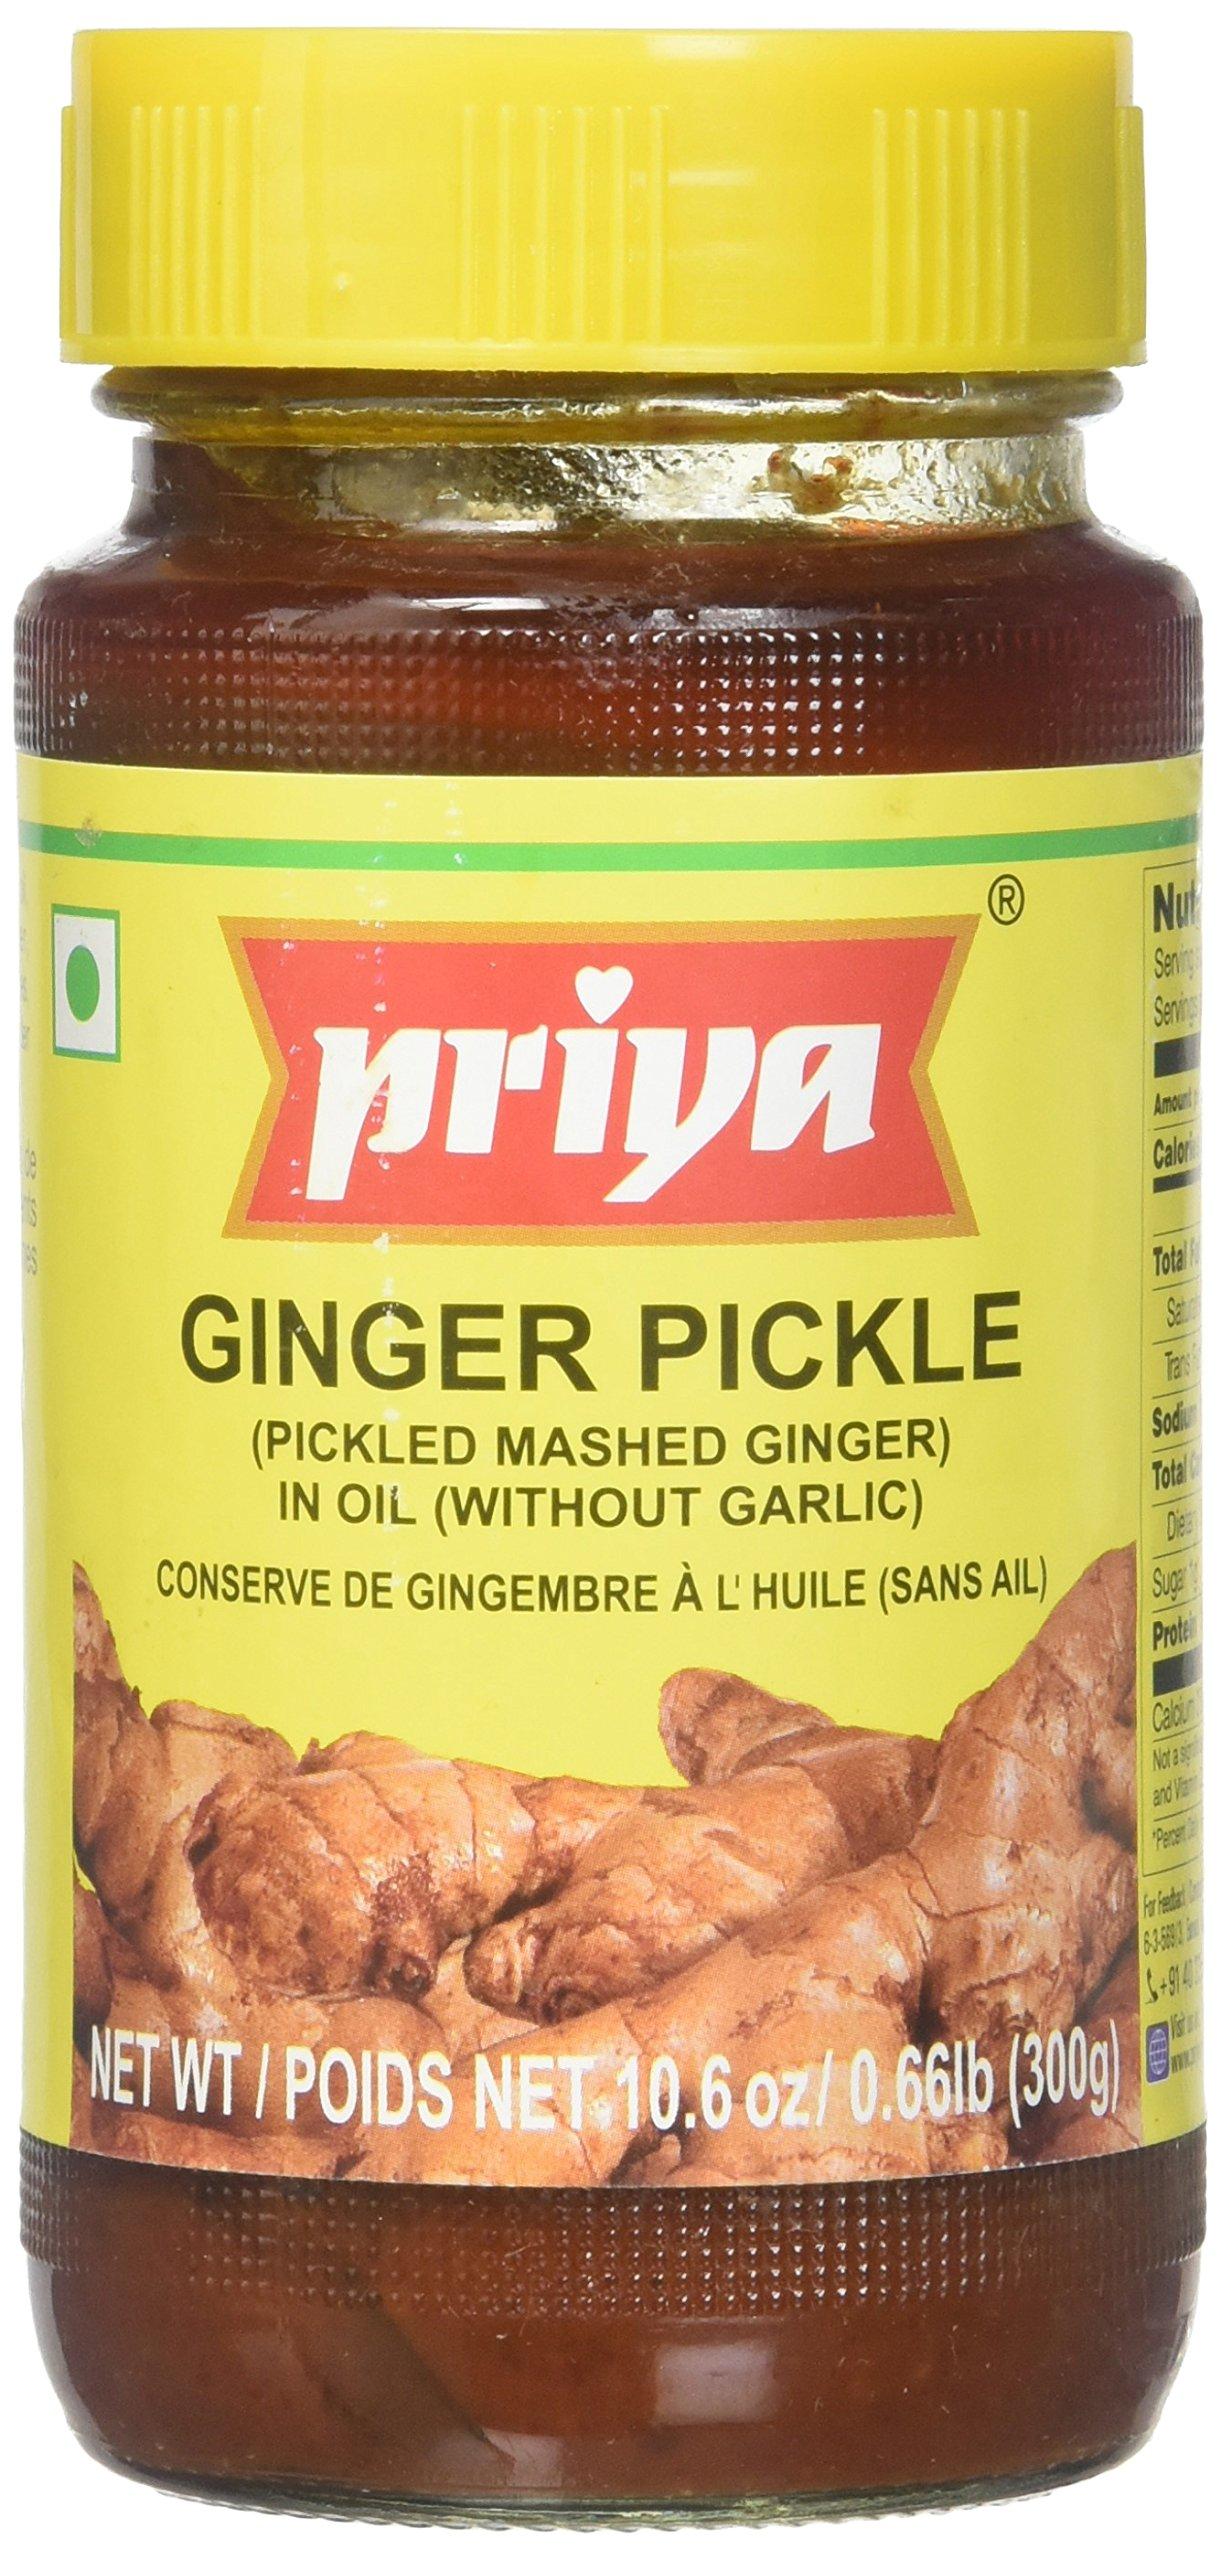 Priya Ginger Pickle 10.6 Oz